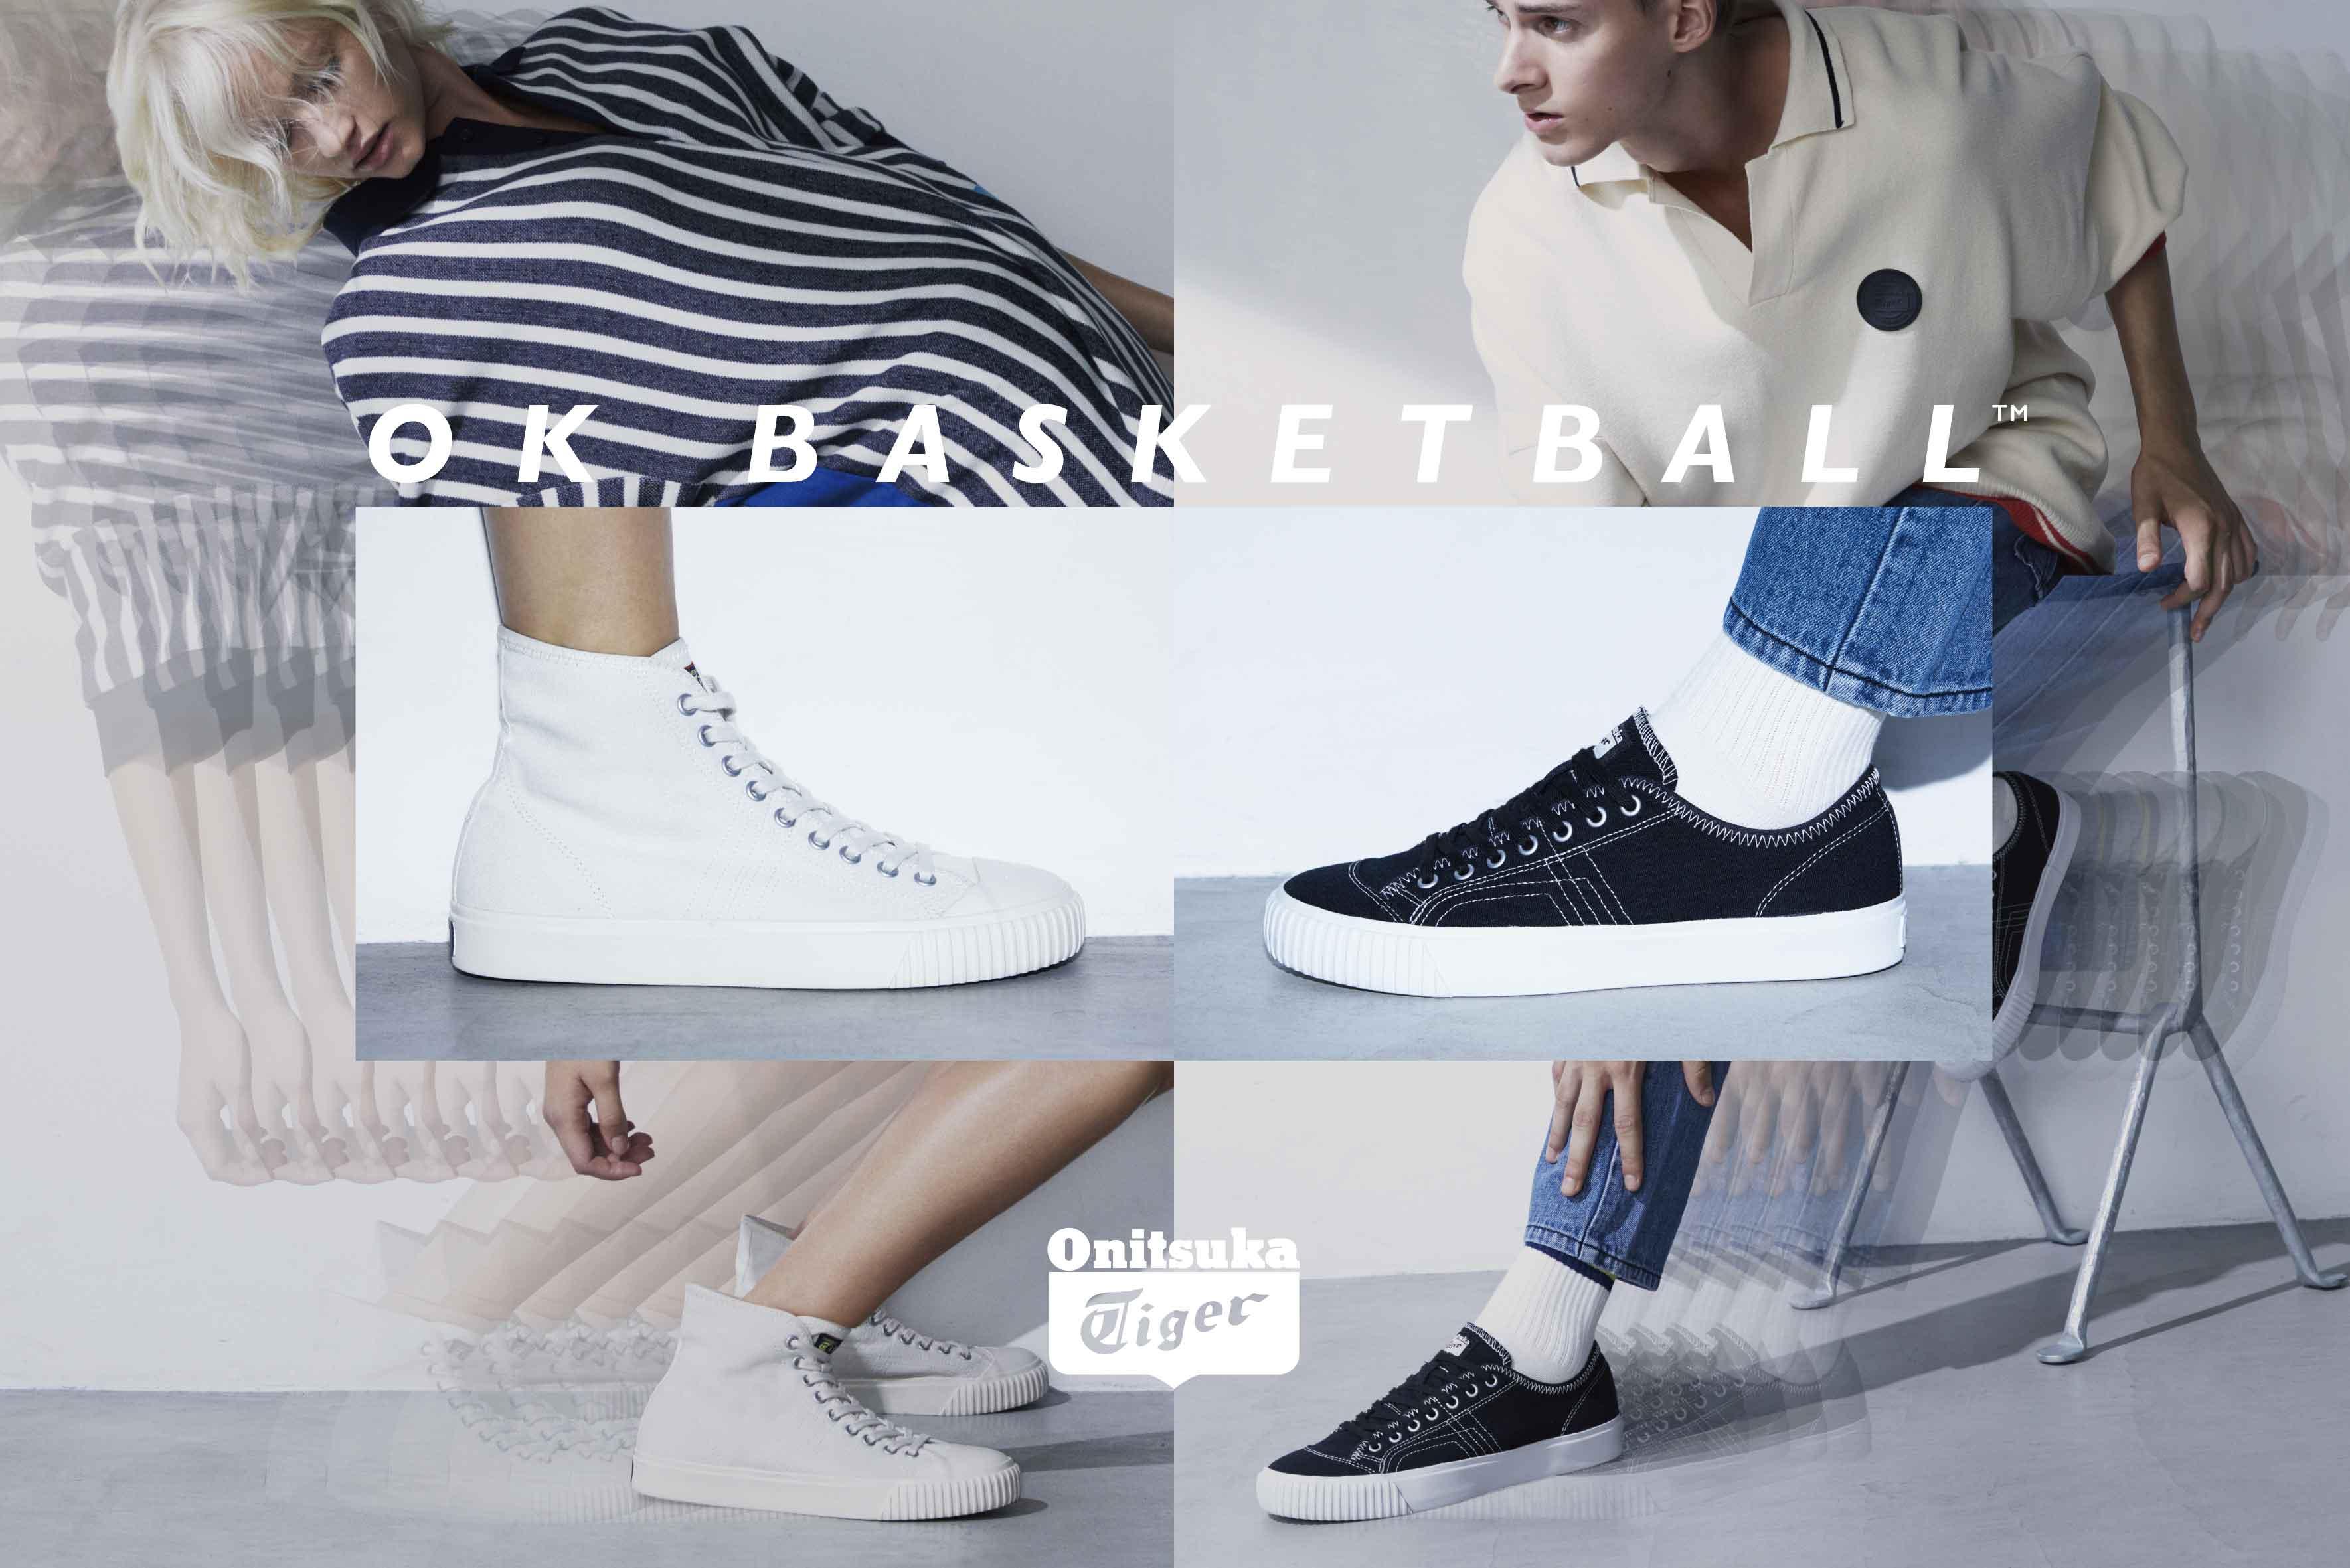 Onitsuka Tiger將發售創業當時所設計的復刻籃球鞋款 運動鞋、